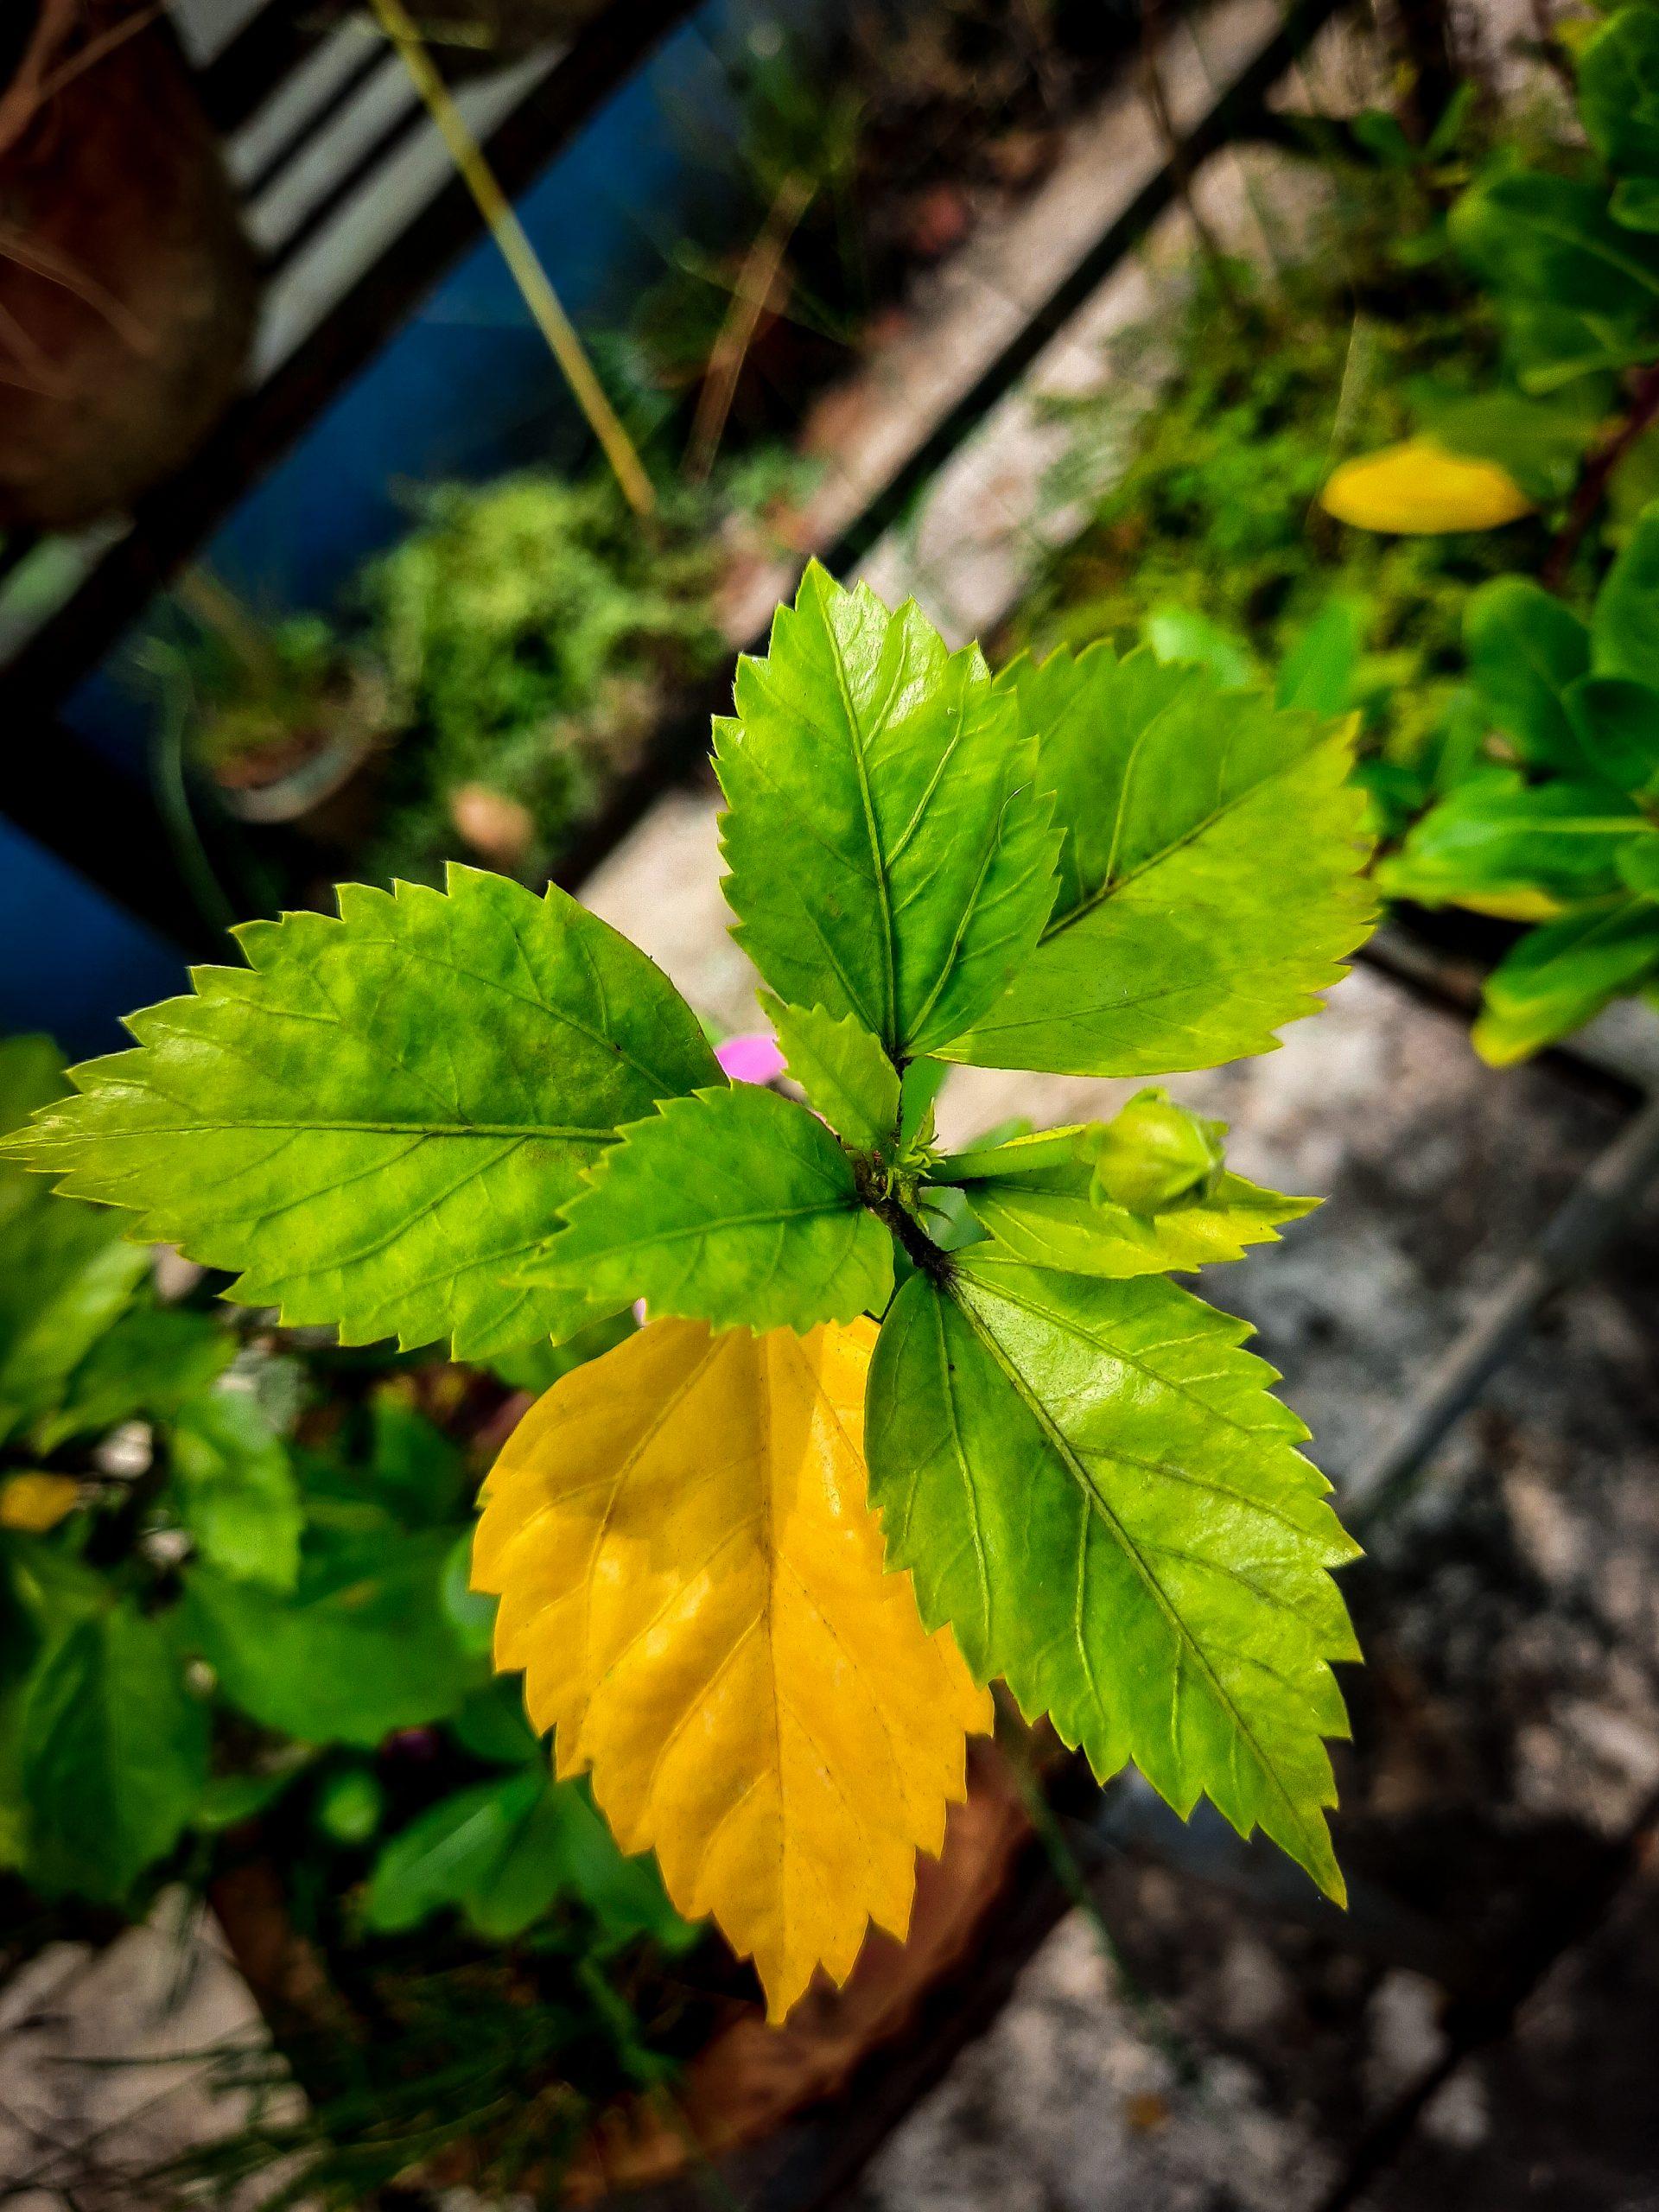 hibiscus leaves